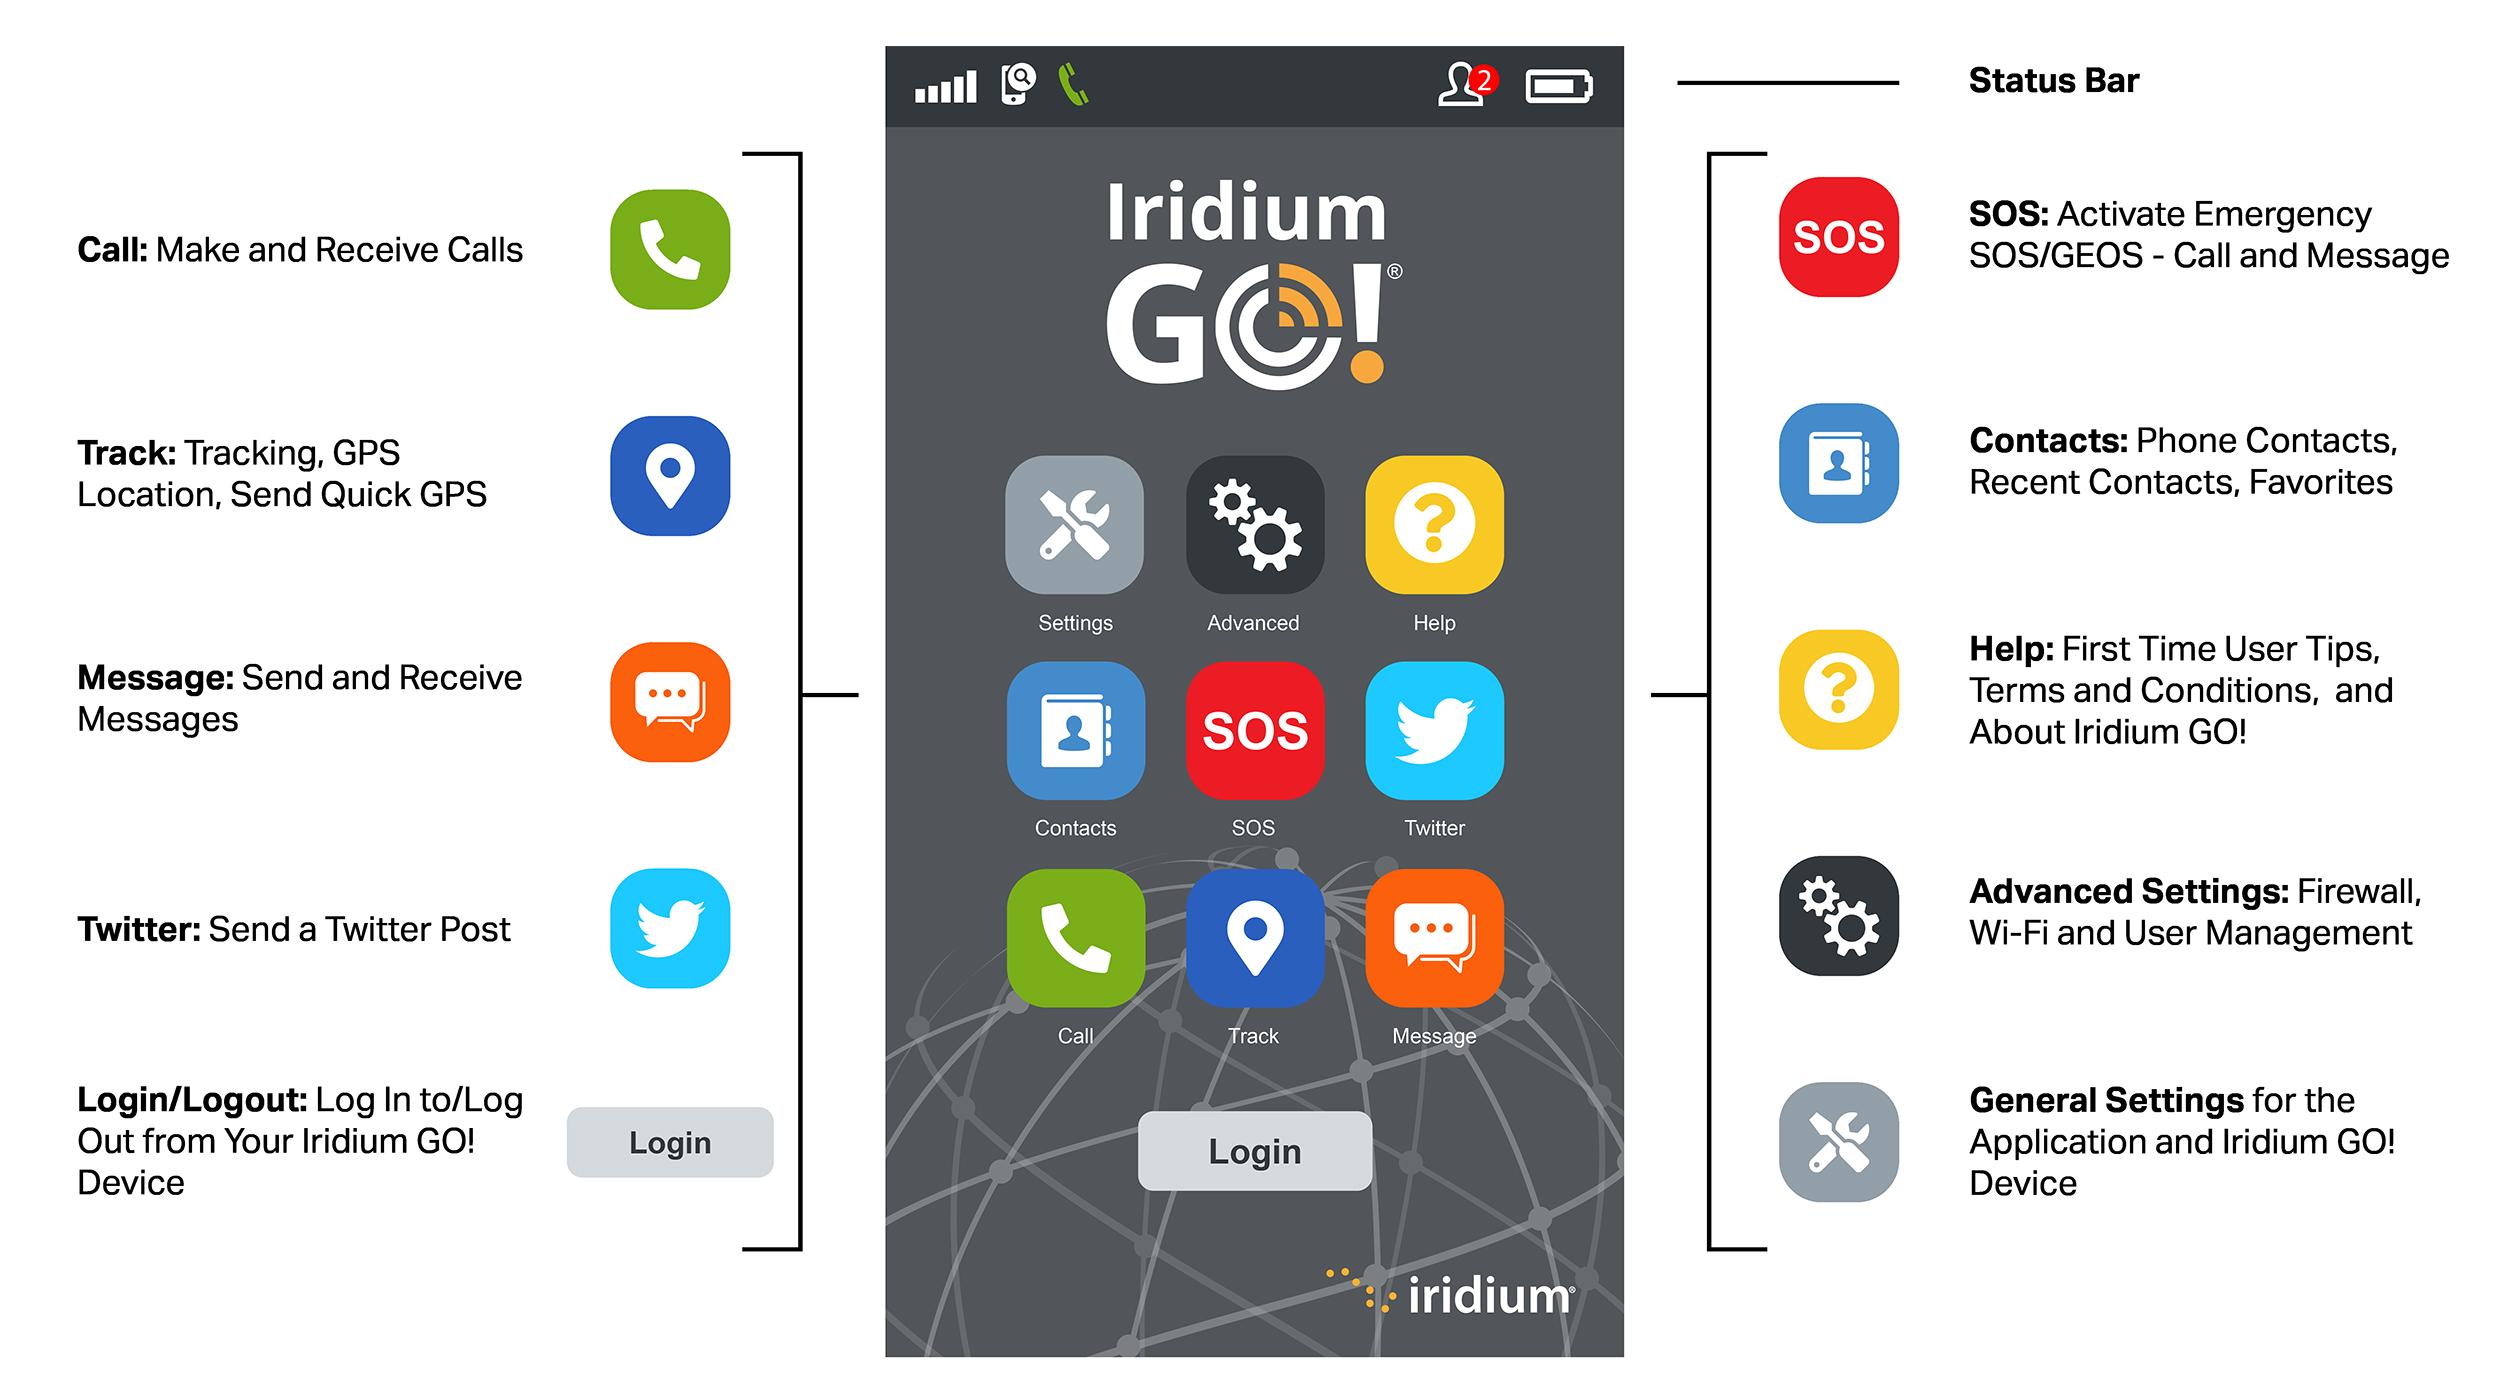 Iridium GO! App Home Screen Explainer